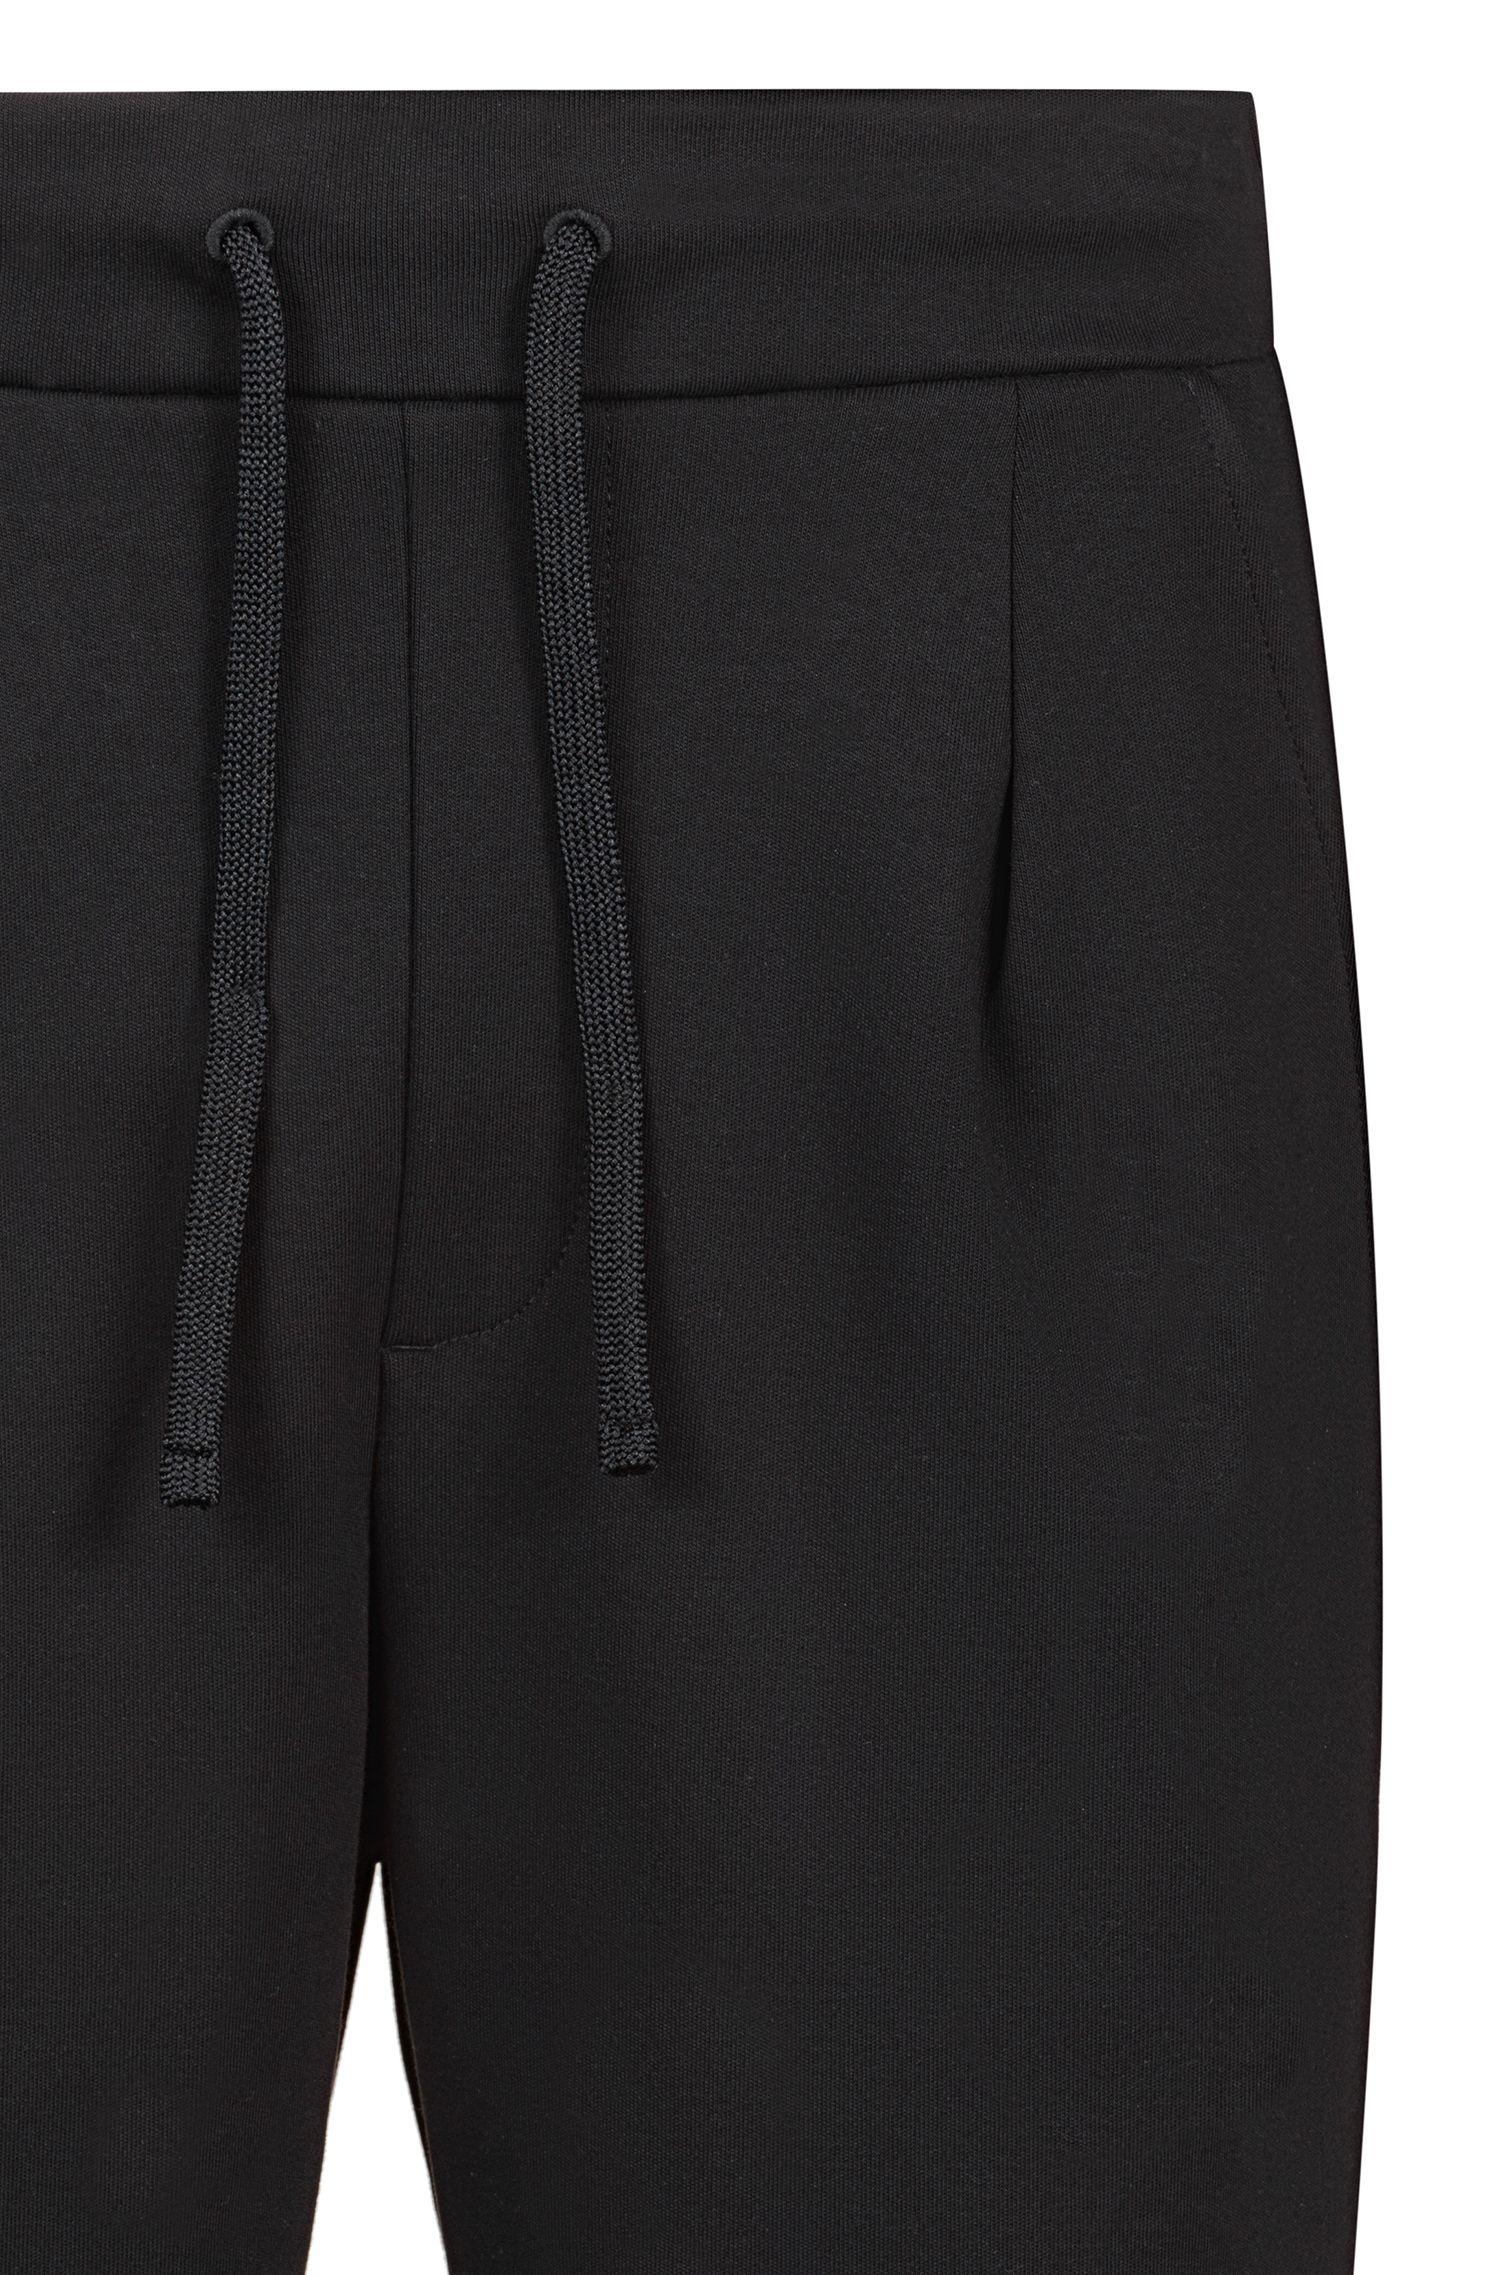 Short Regular Fit en jersey avec poche plaquée en mesh, Noir